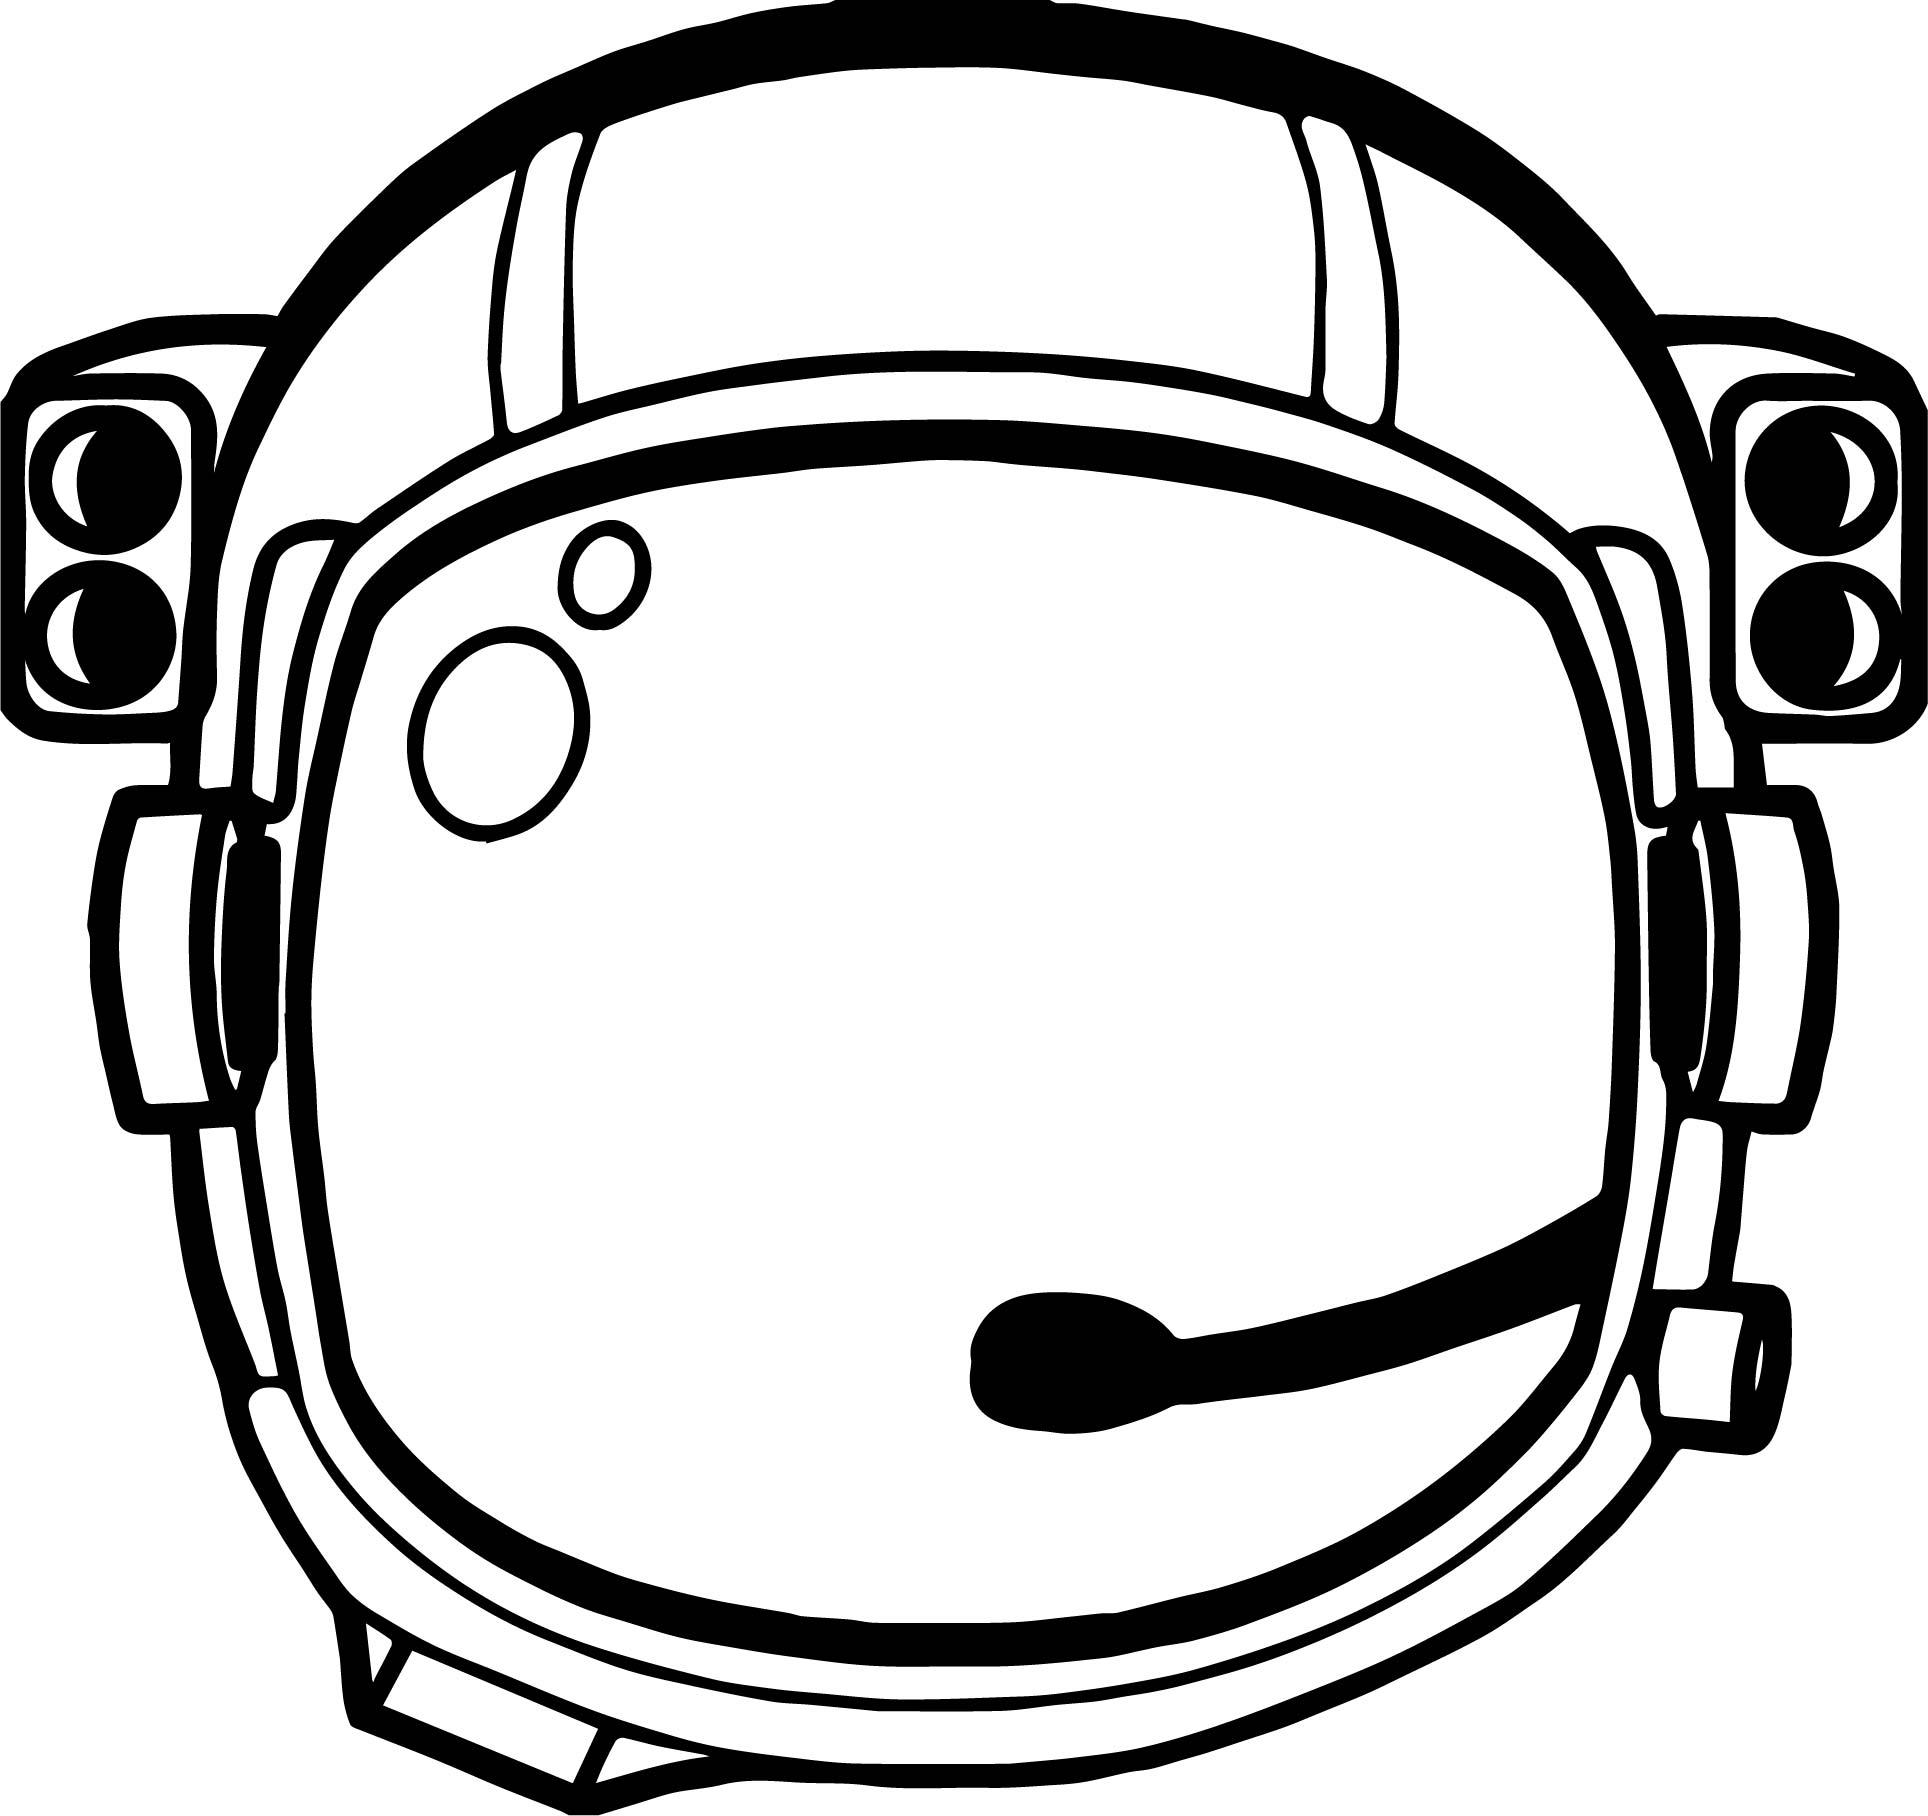 Astronaut Helmet Coloring Page